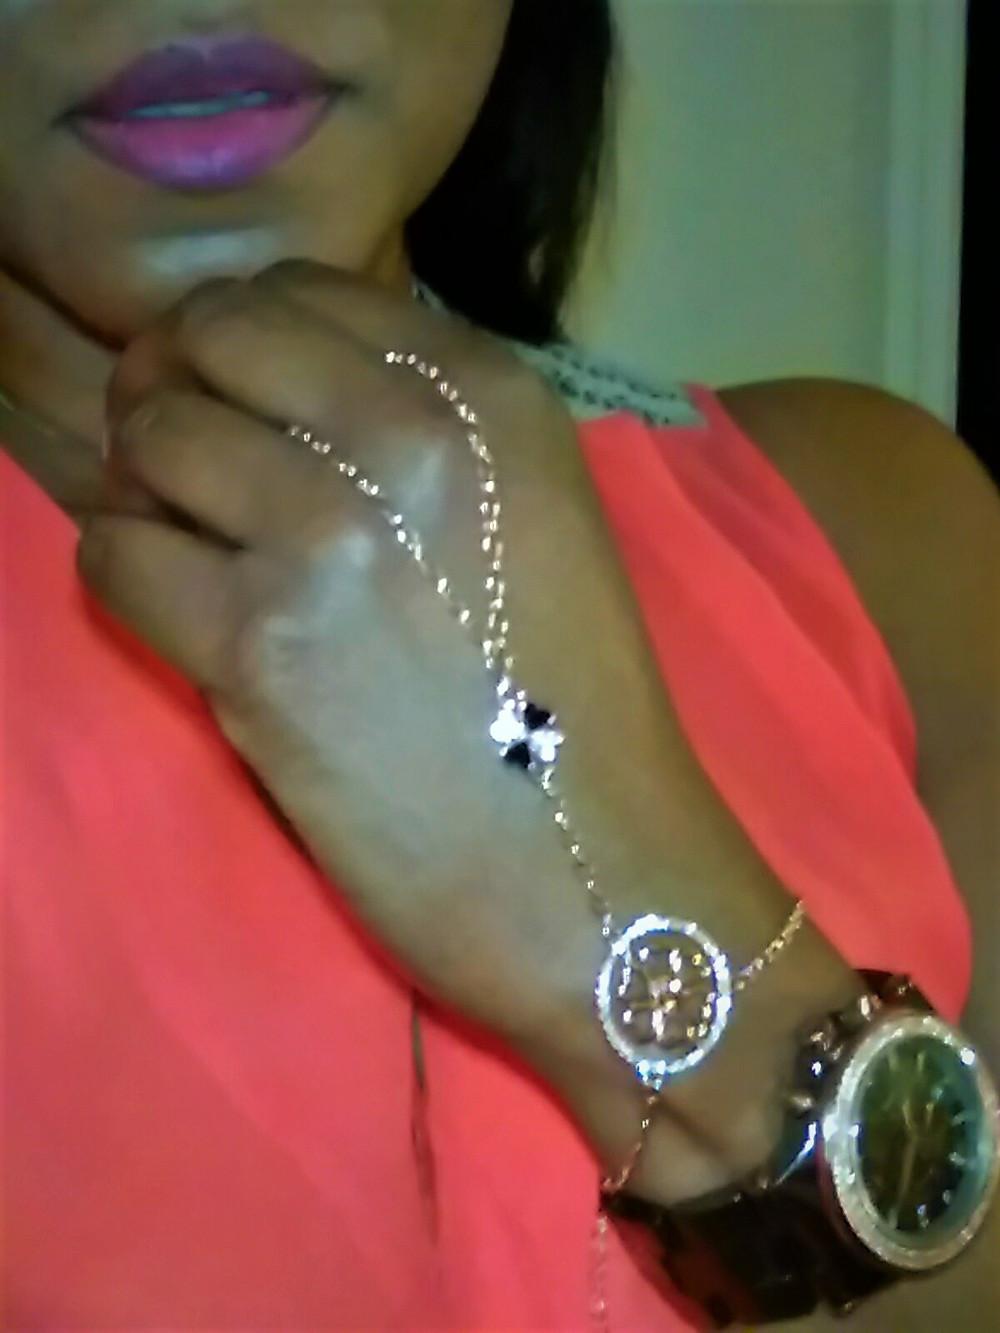 alluring woman, uncommon style, uncommon goods, jewelry, jewellery, unique jewelry